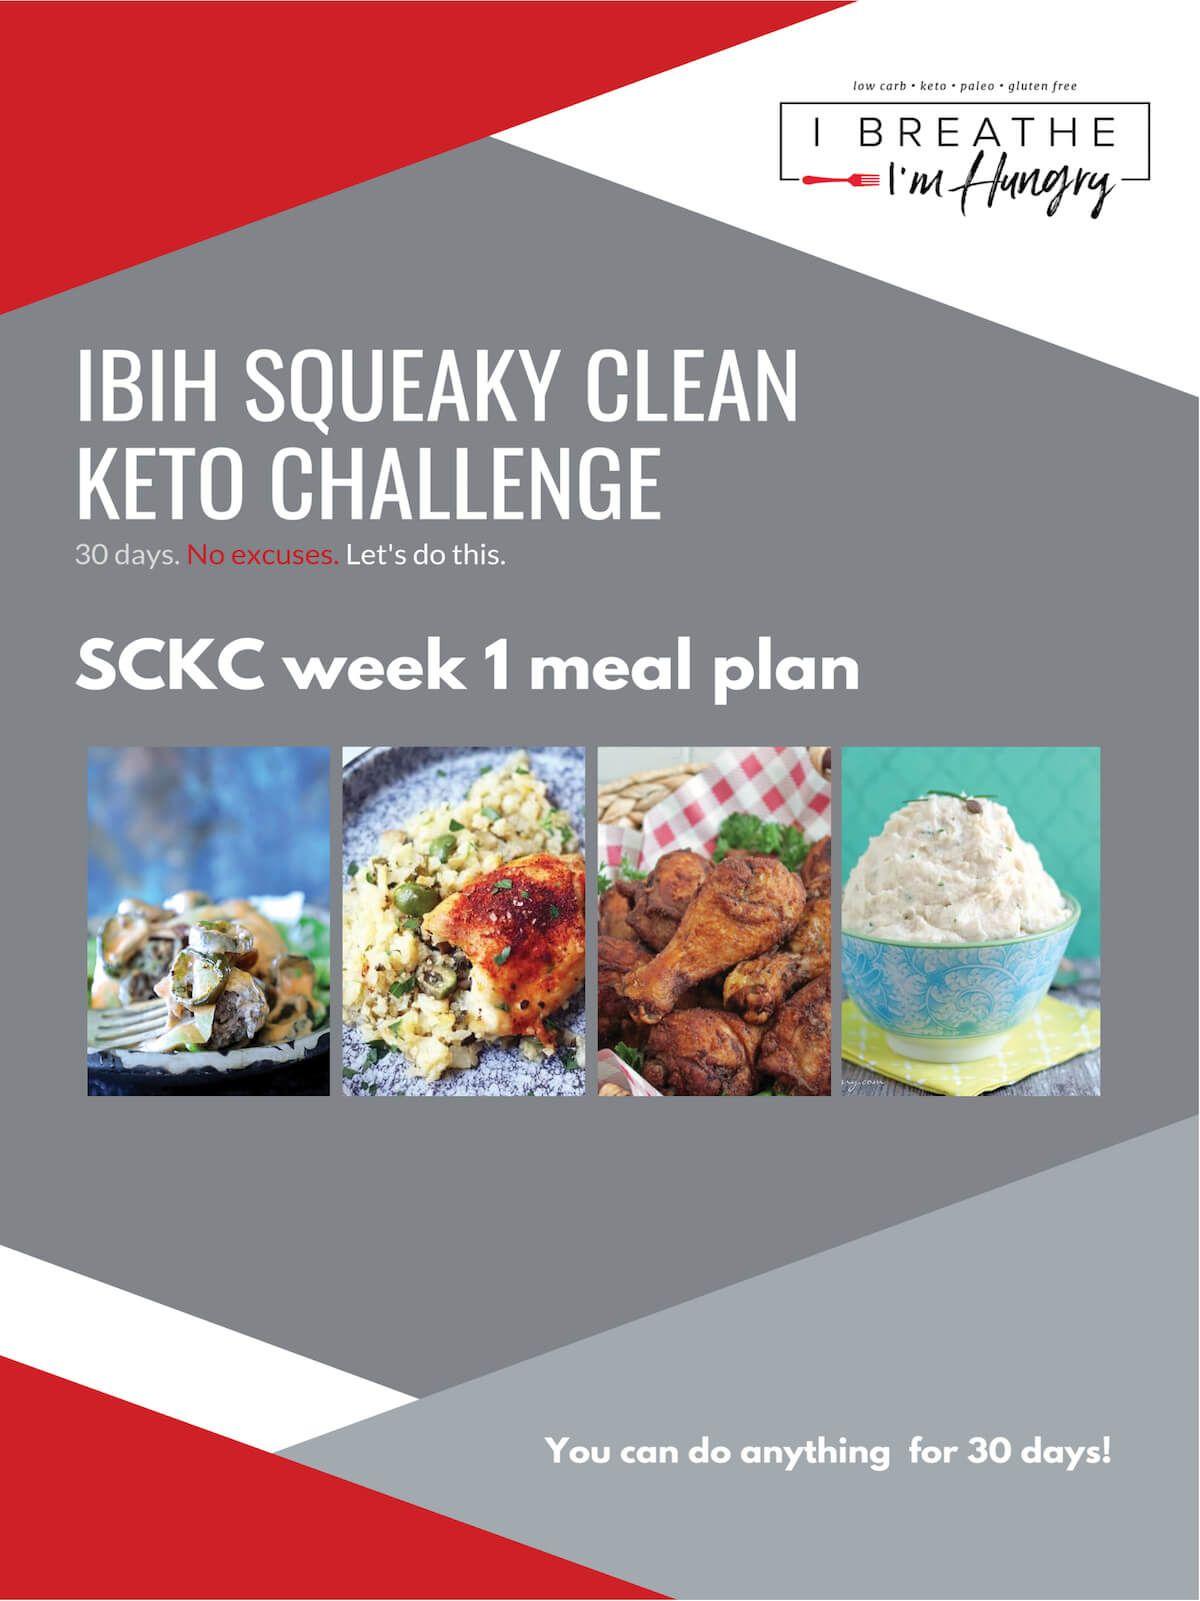 Ibih Squeaky Clean Keto Challenge Week 1 Meal Plan I Breathe I M